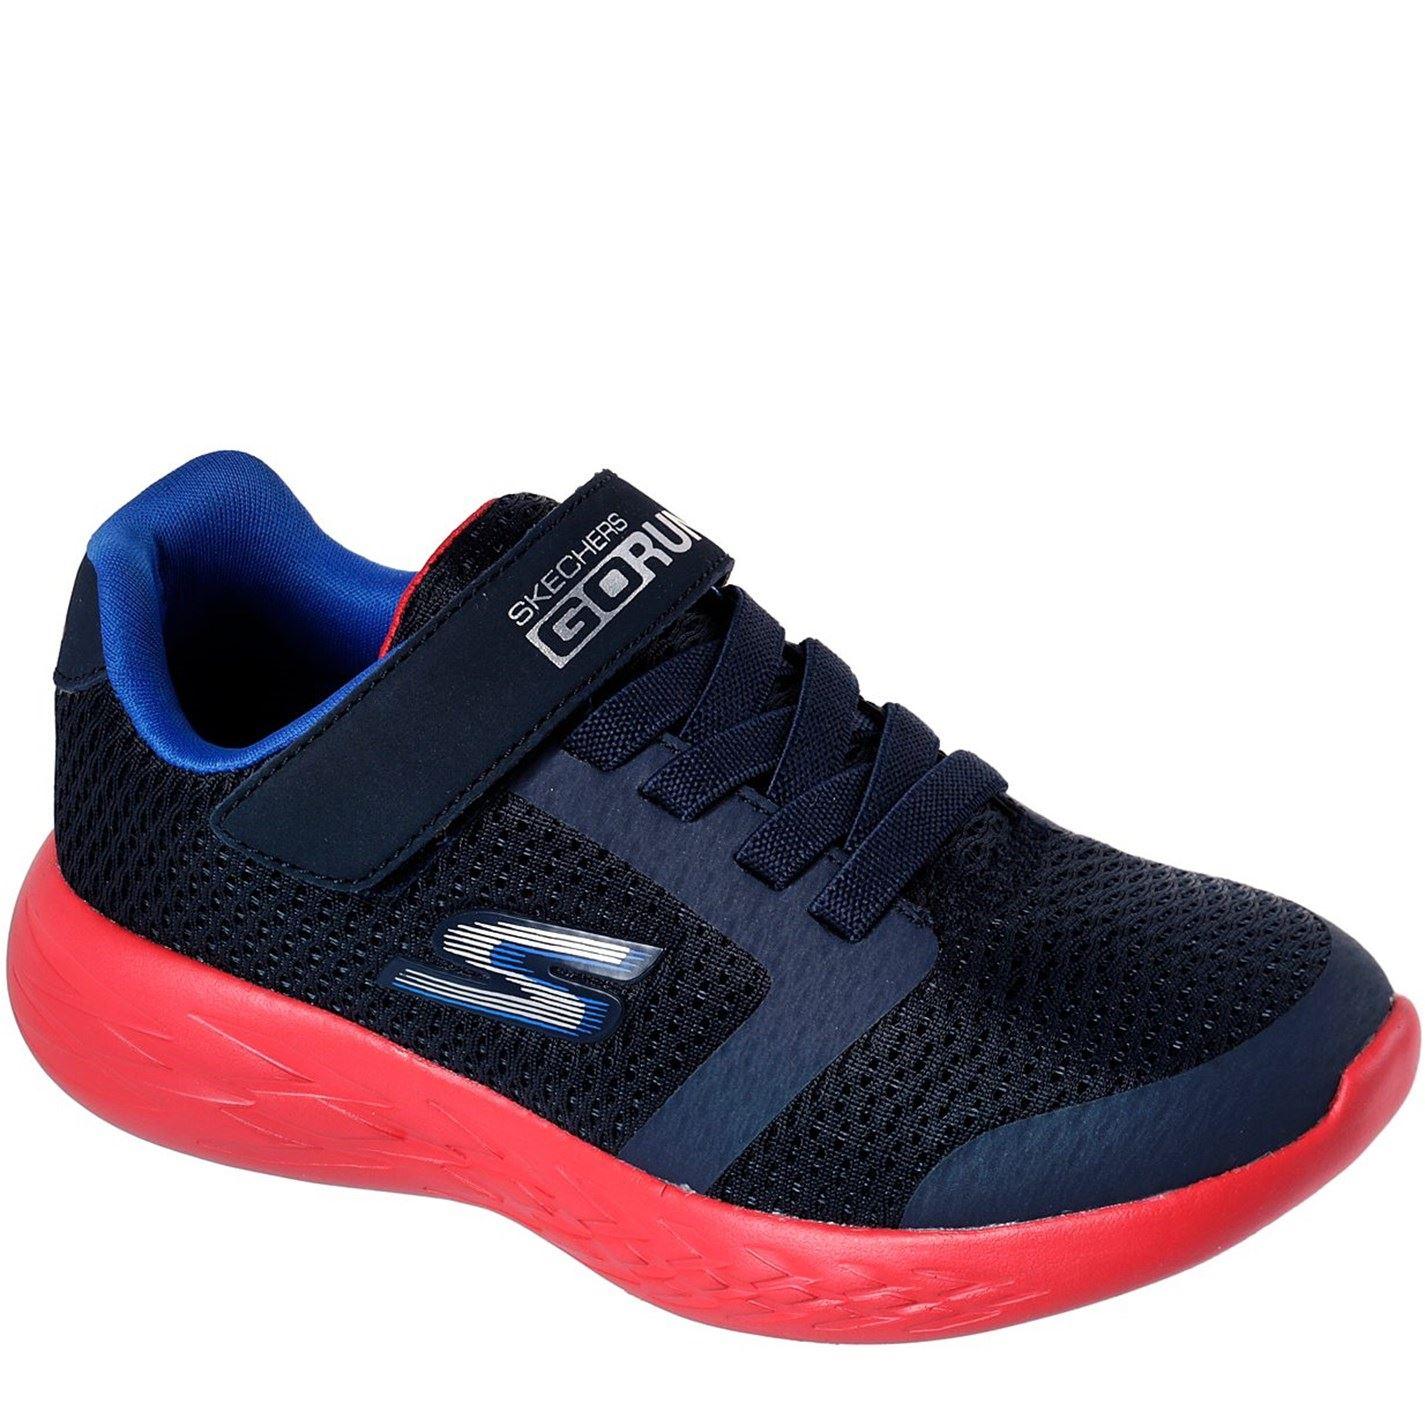 Adidasi Skechers GoRun Adidasi sport 600 pentru Bebelusi bleumarin rosu